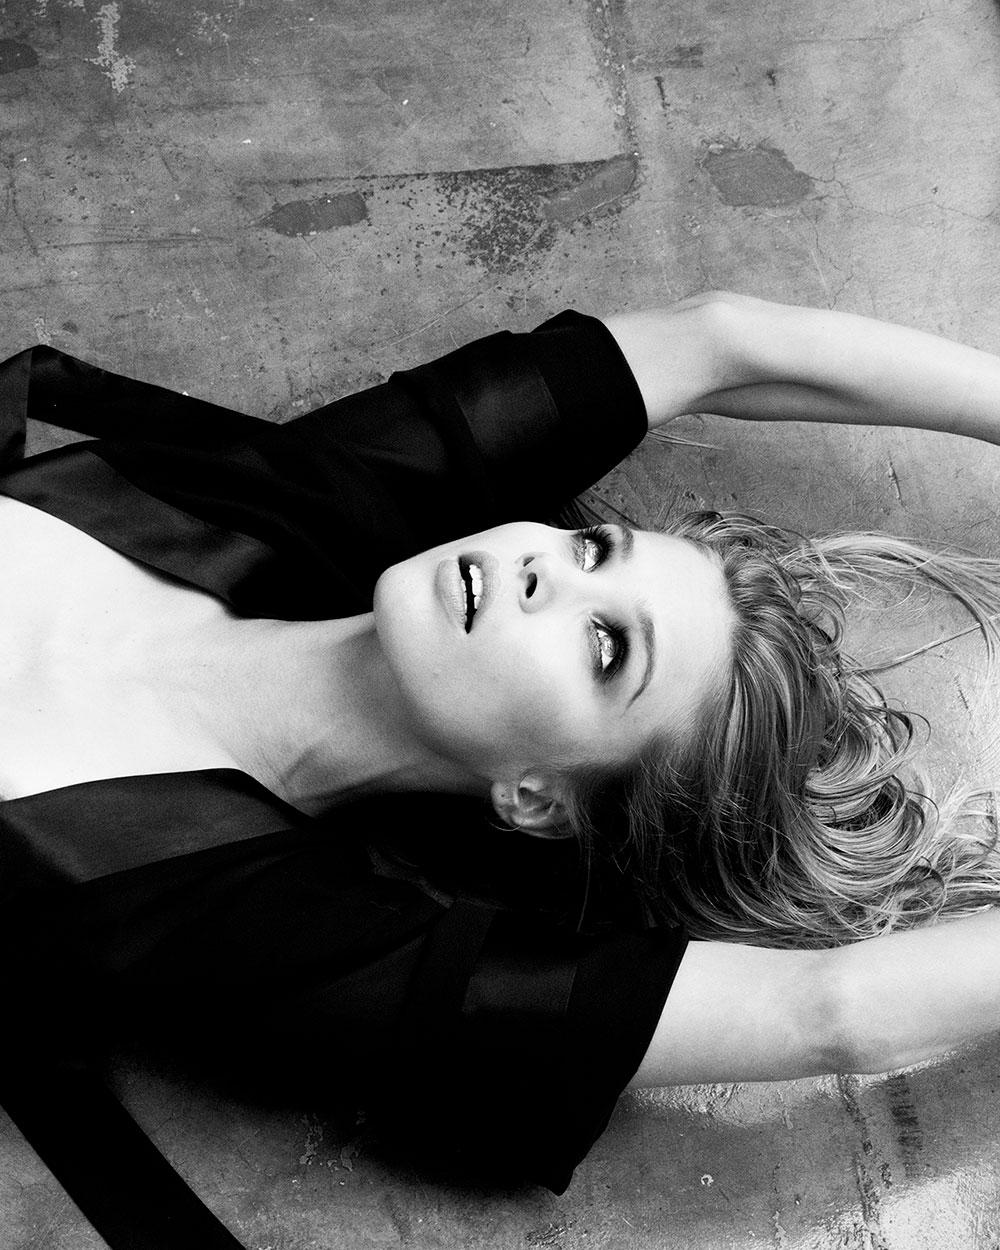 Black and white photo of Allie Leggett by Michael Donovan for MONROWE Magazine